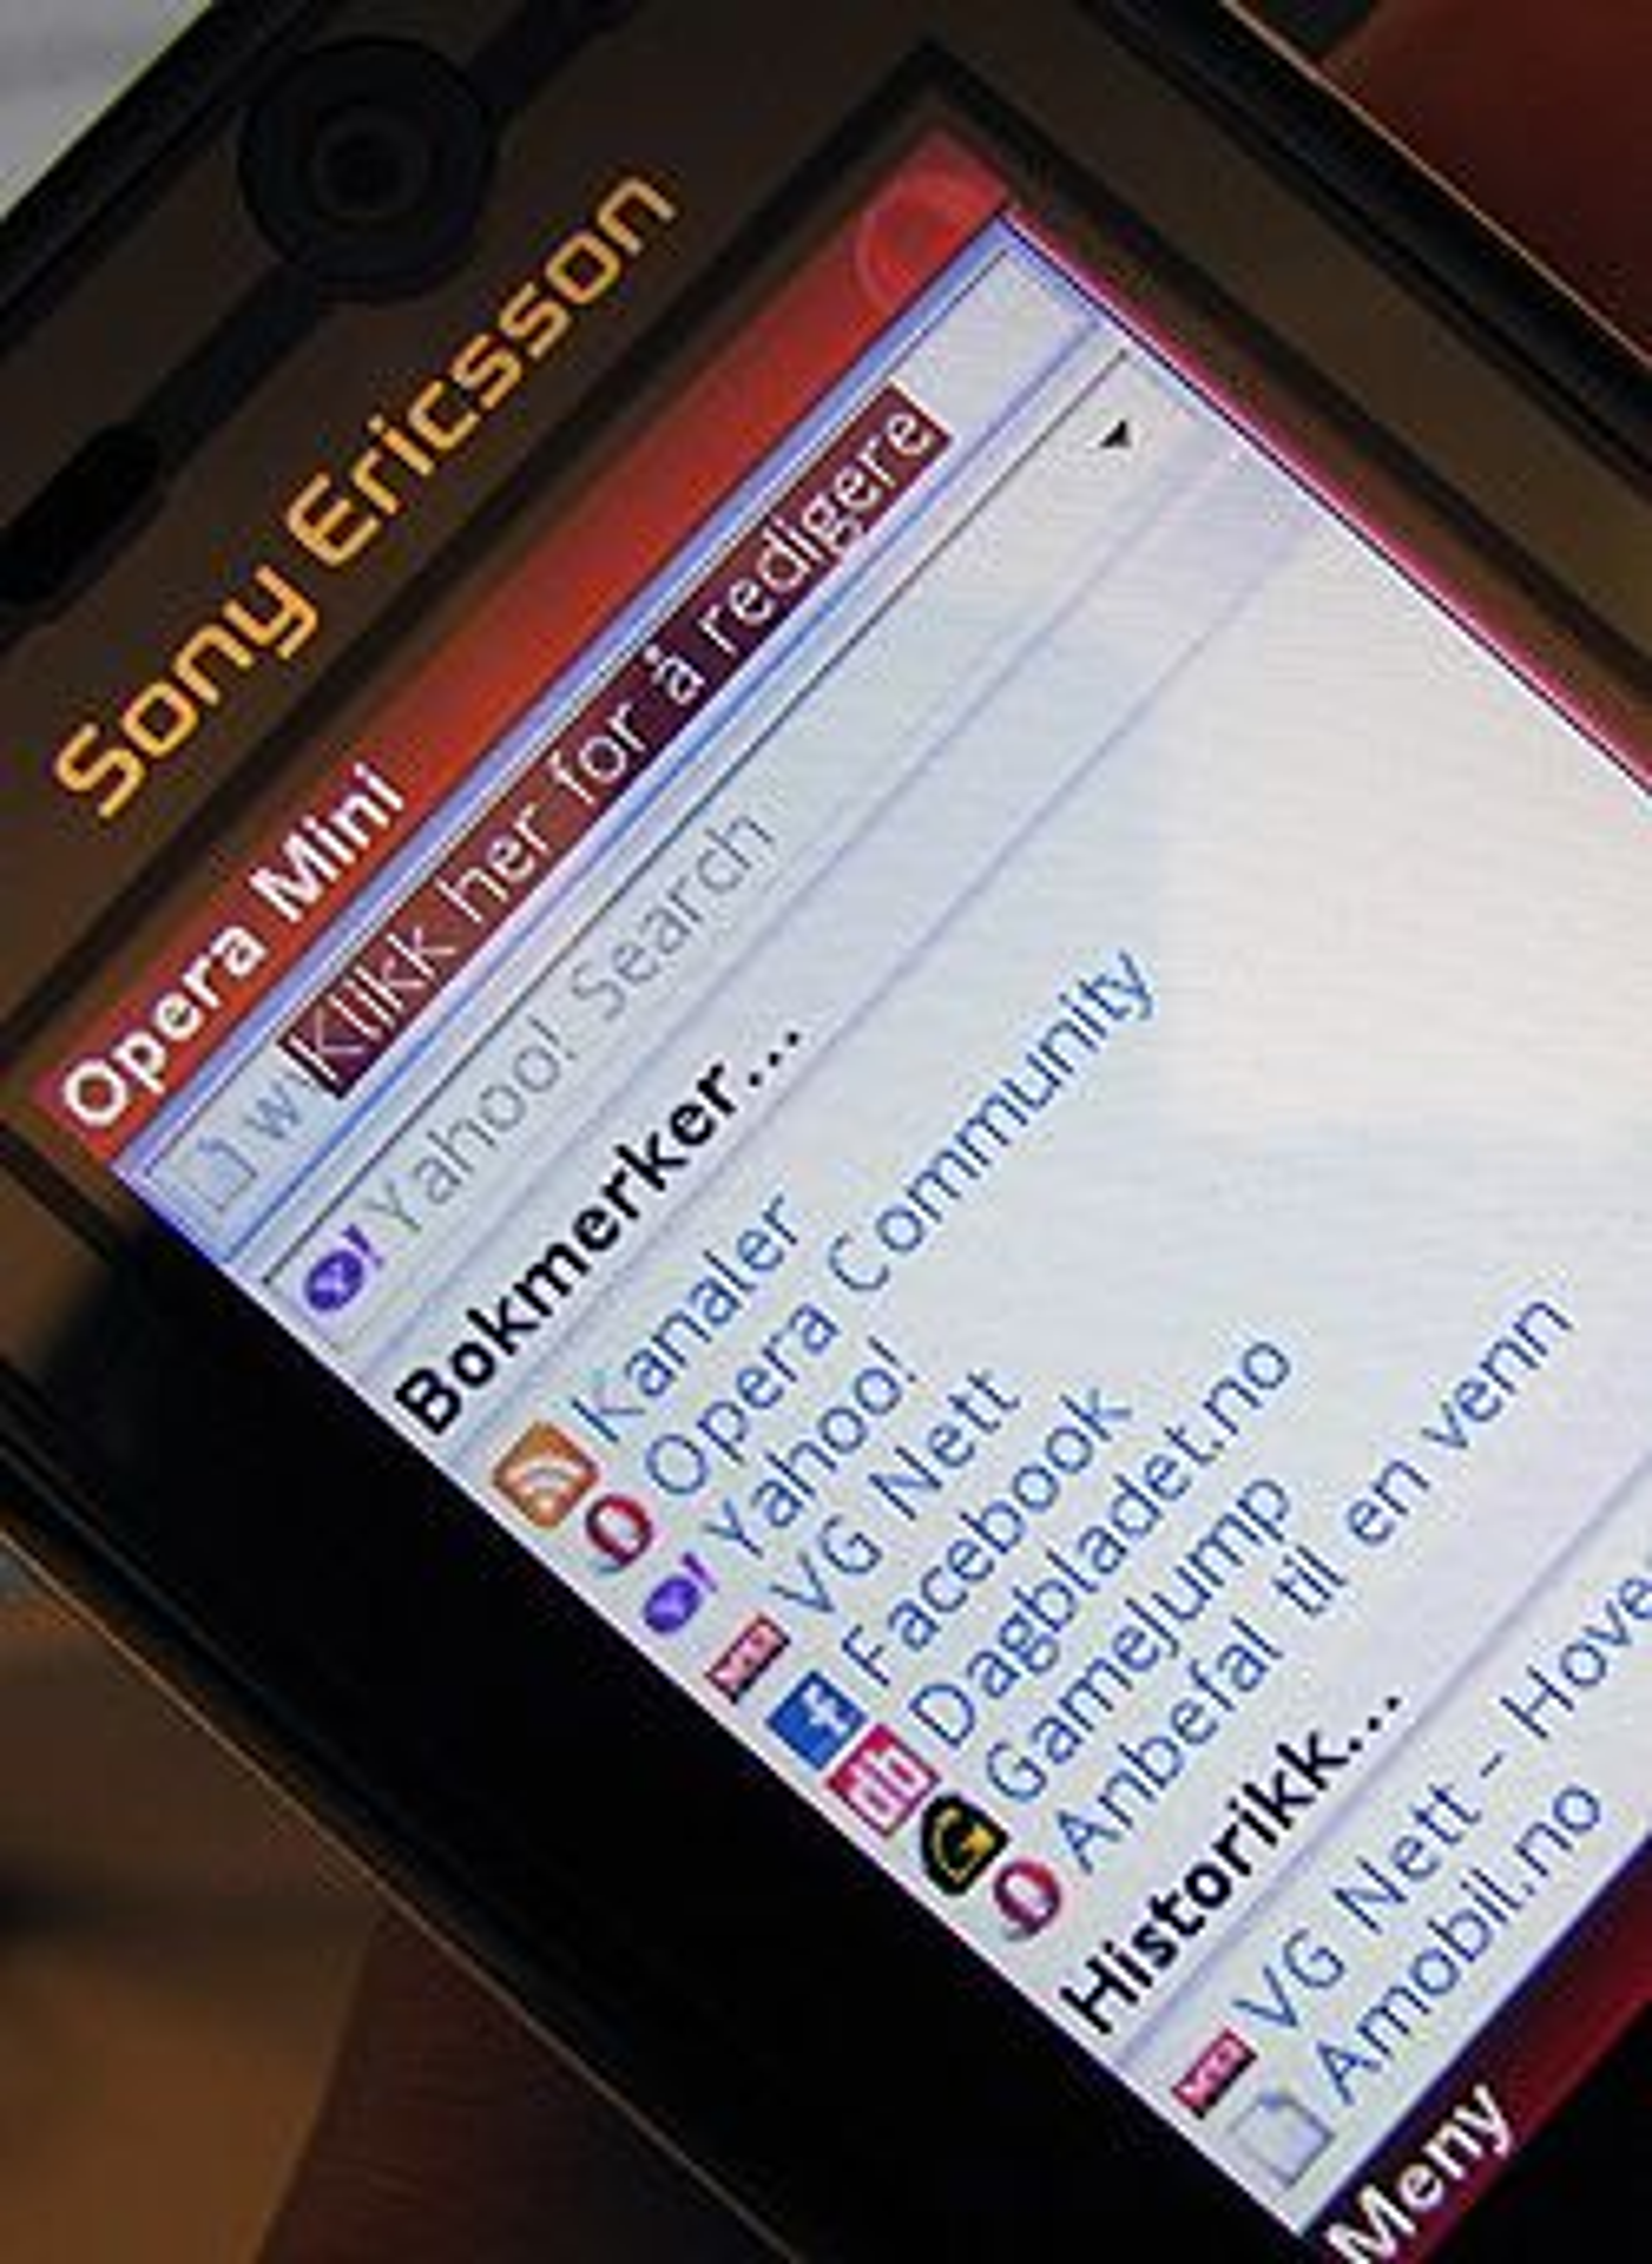 Opera tjener gode penger på sine mobile nettlesere. (Foto: Silje Gomnæs)